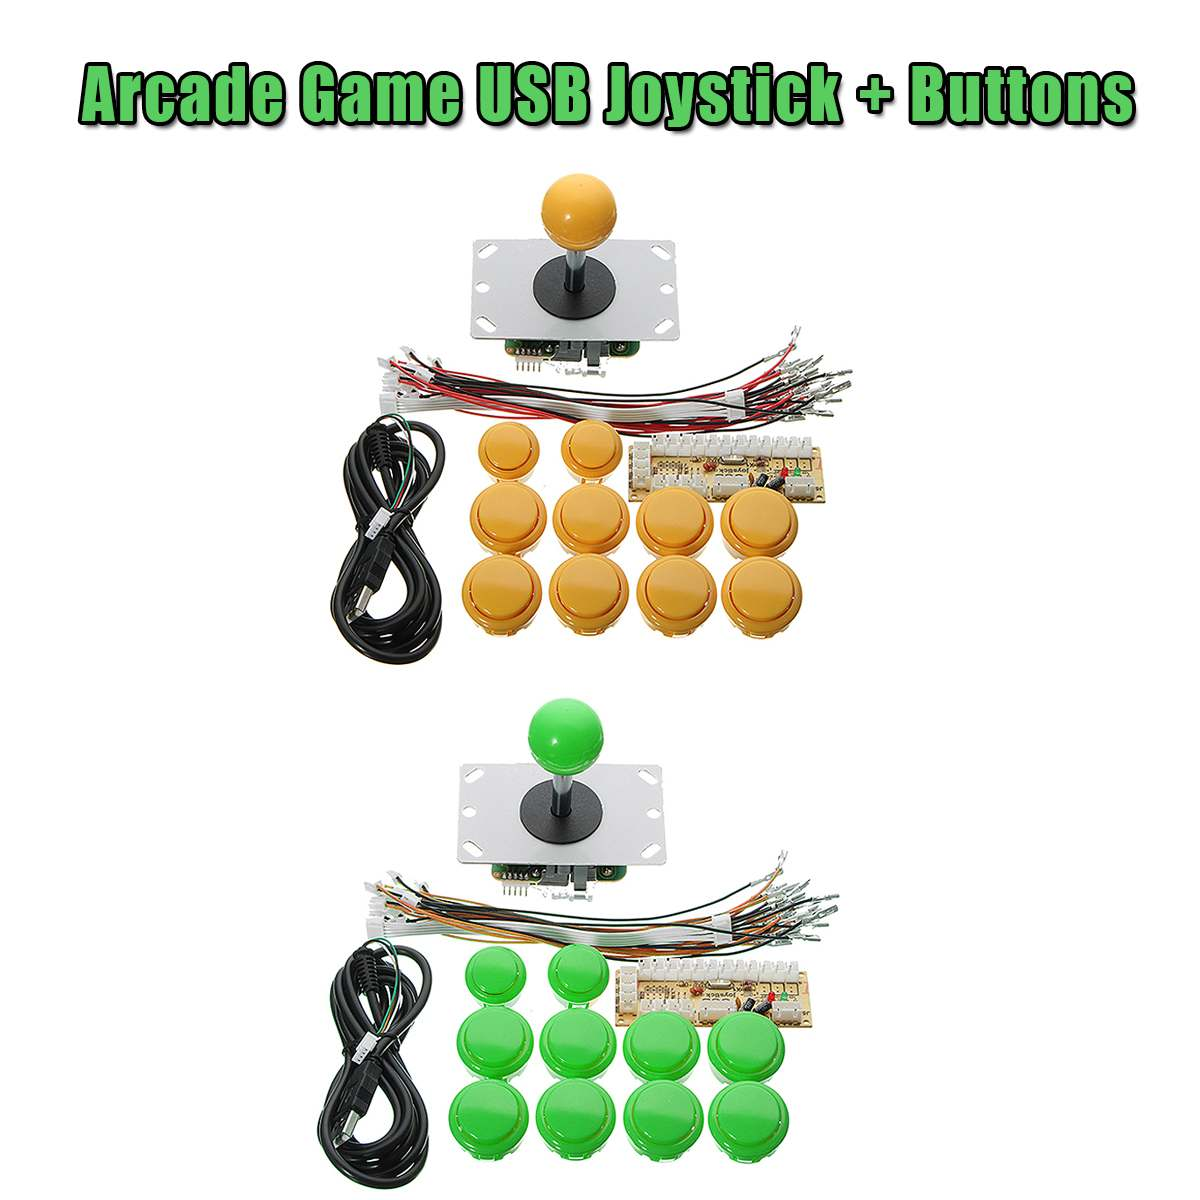 Zero Delay Arcade Joystick DIY LED USB Encoder+Joystick+Shine Push Buttons+Cables For Arcade Game For MAME For Raspberry Pi1/2/3